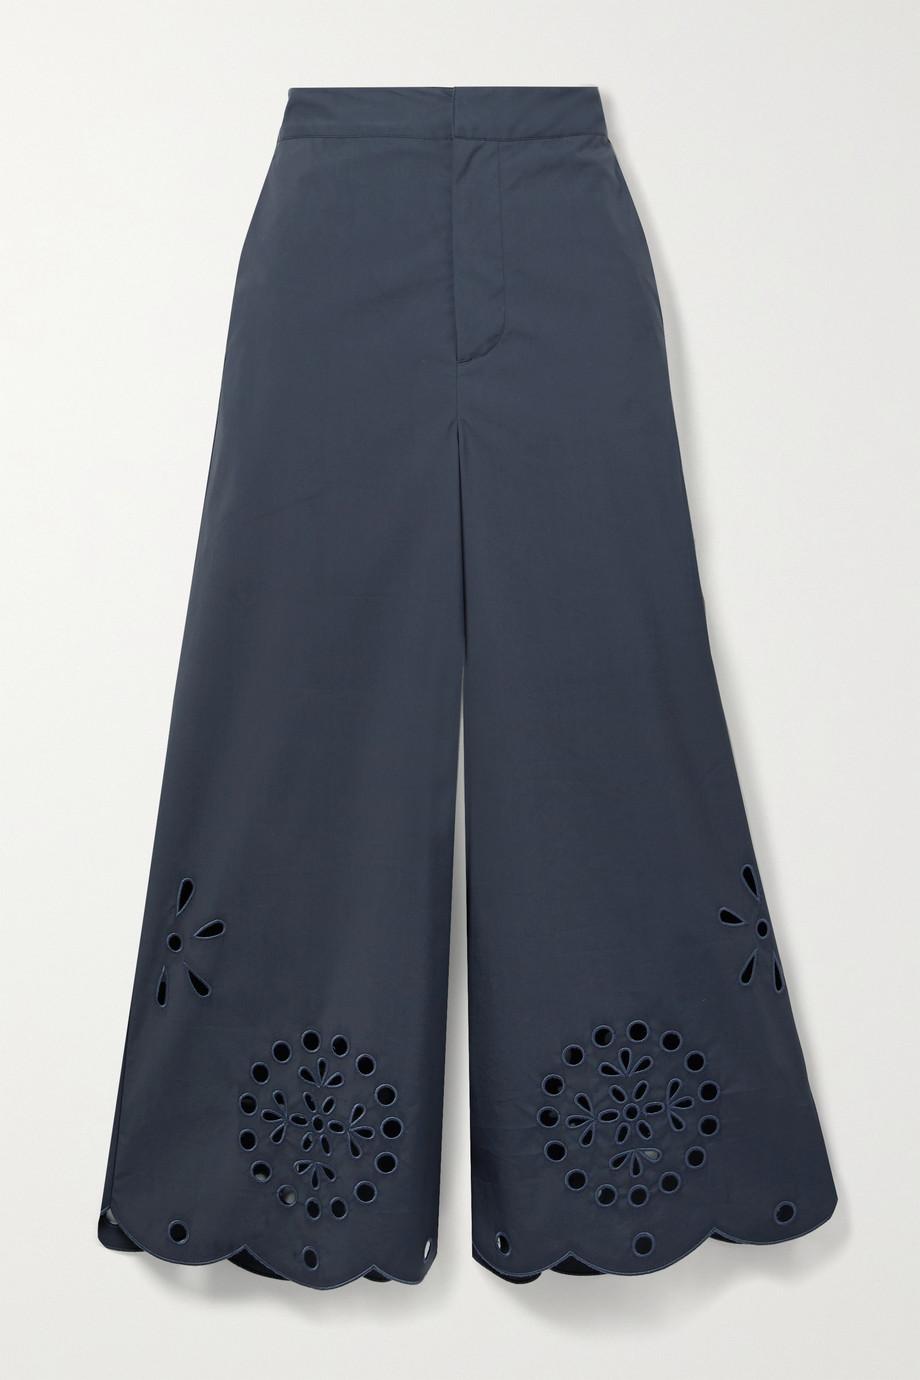 Jason Wu Broderie anglaise cotton-blend poplin culottes